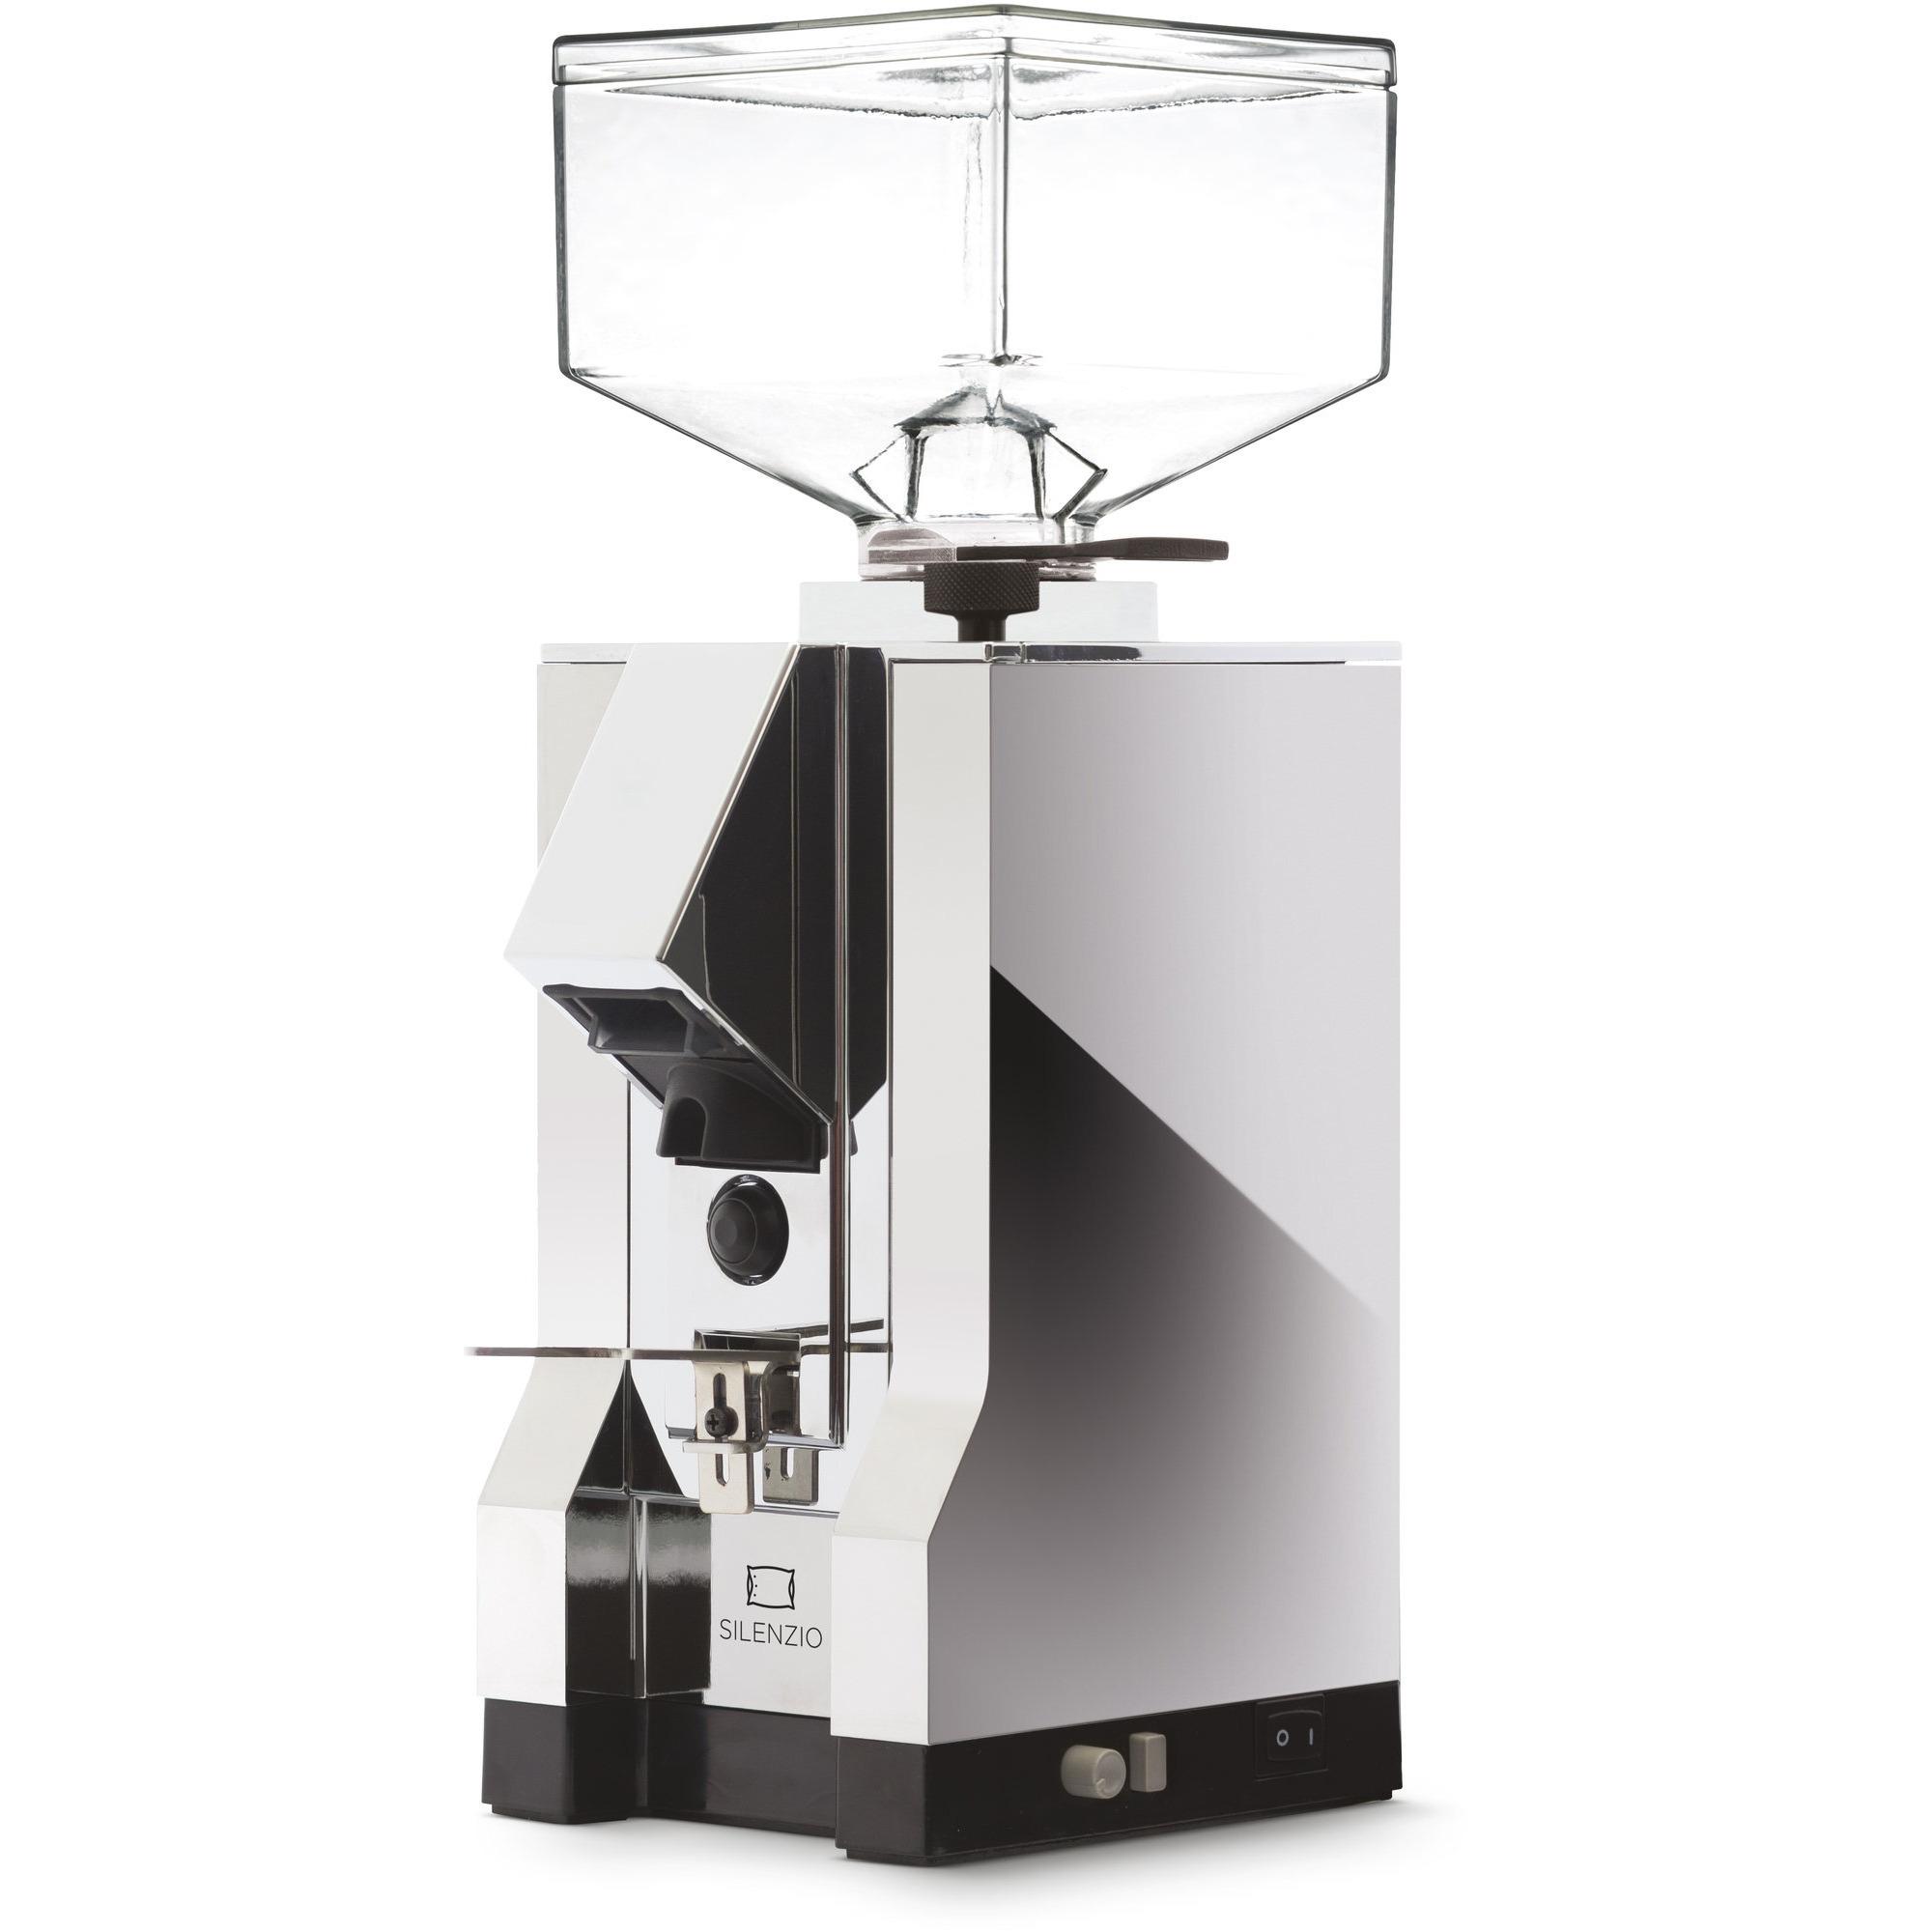 Eureka MIGNON Silenzio Elektrisk Kaffekvarn Chrome